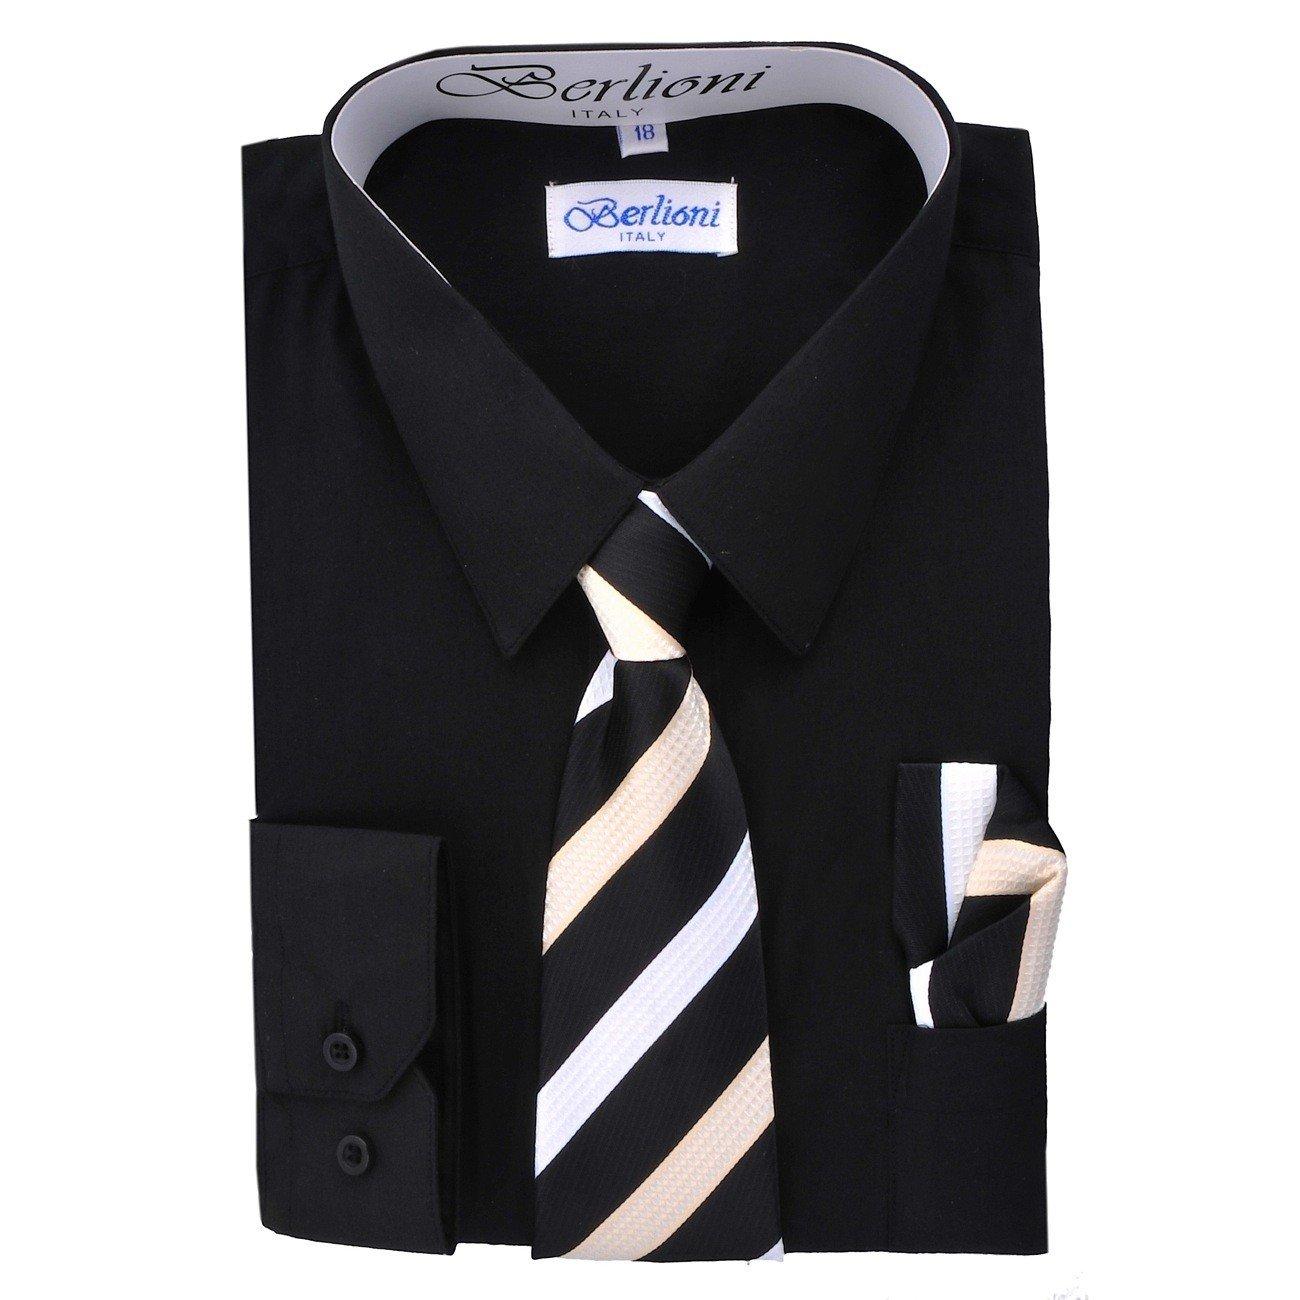 Boy's Dress Shirt, Necktie, and Hanky Set - Black, Size 12 Boy' s Dress Shirt 700A-BLK-12